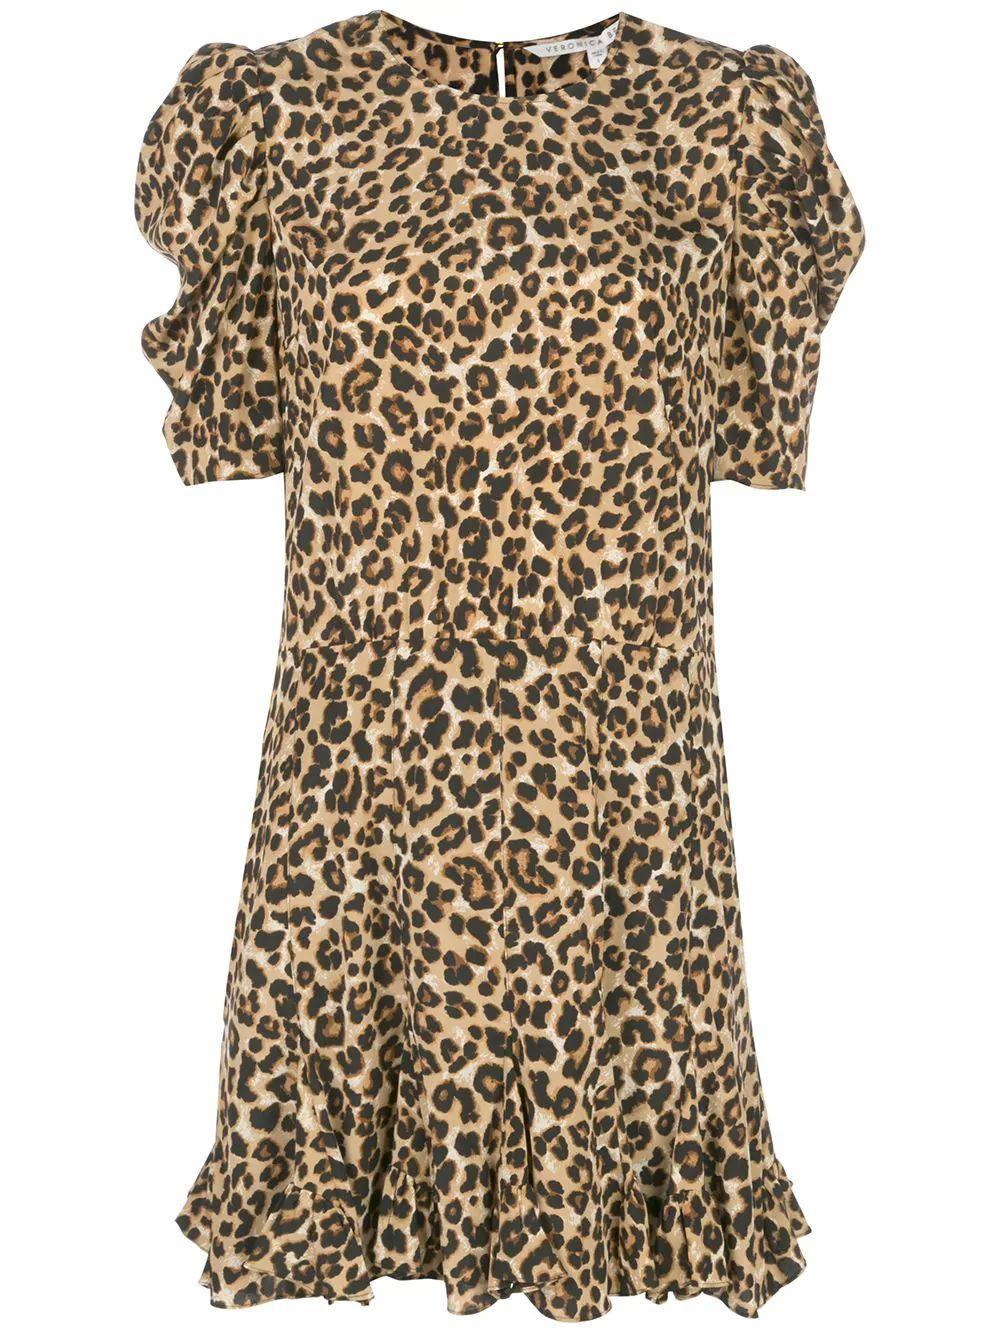 Lila Elbow Sleeve Short Dress Item # 1907SDC012685